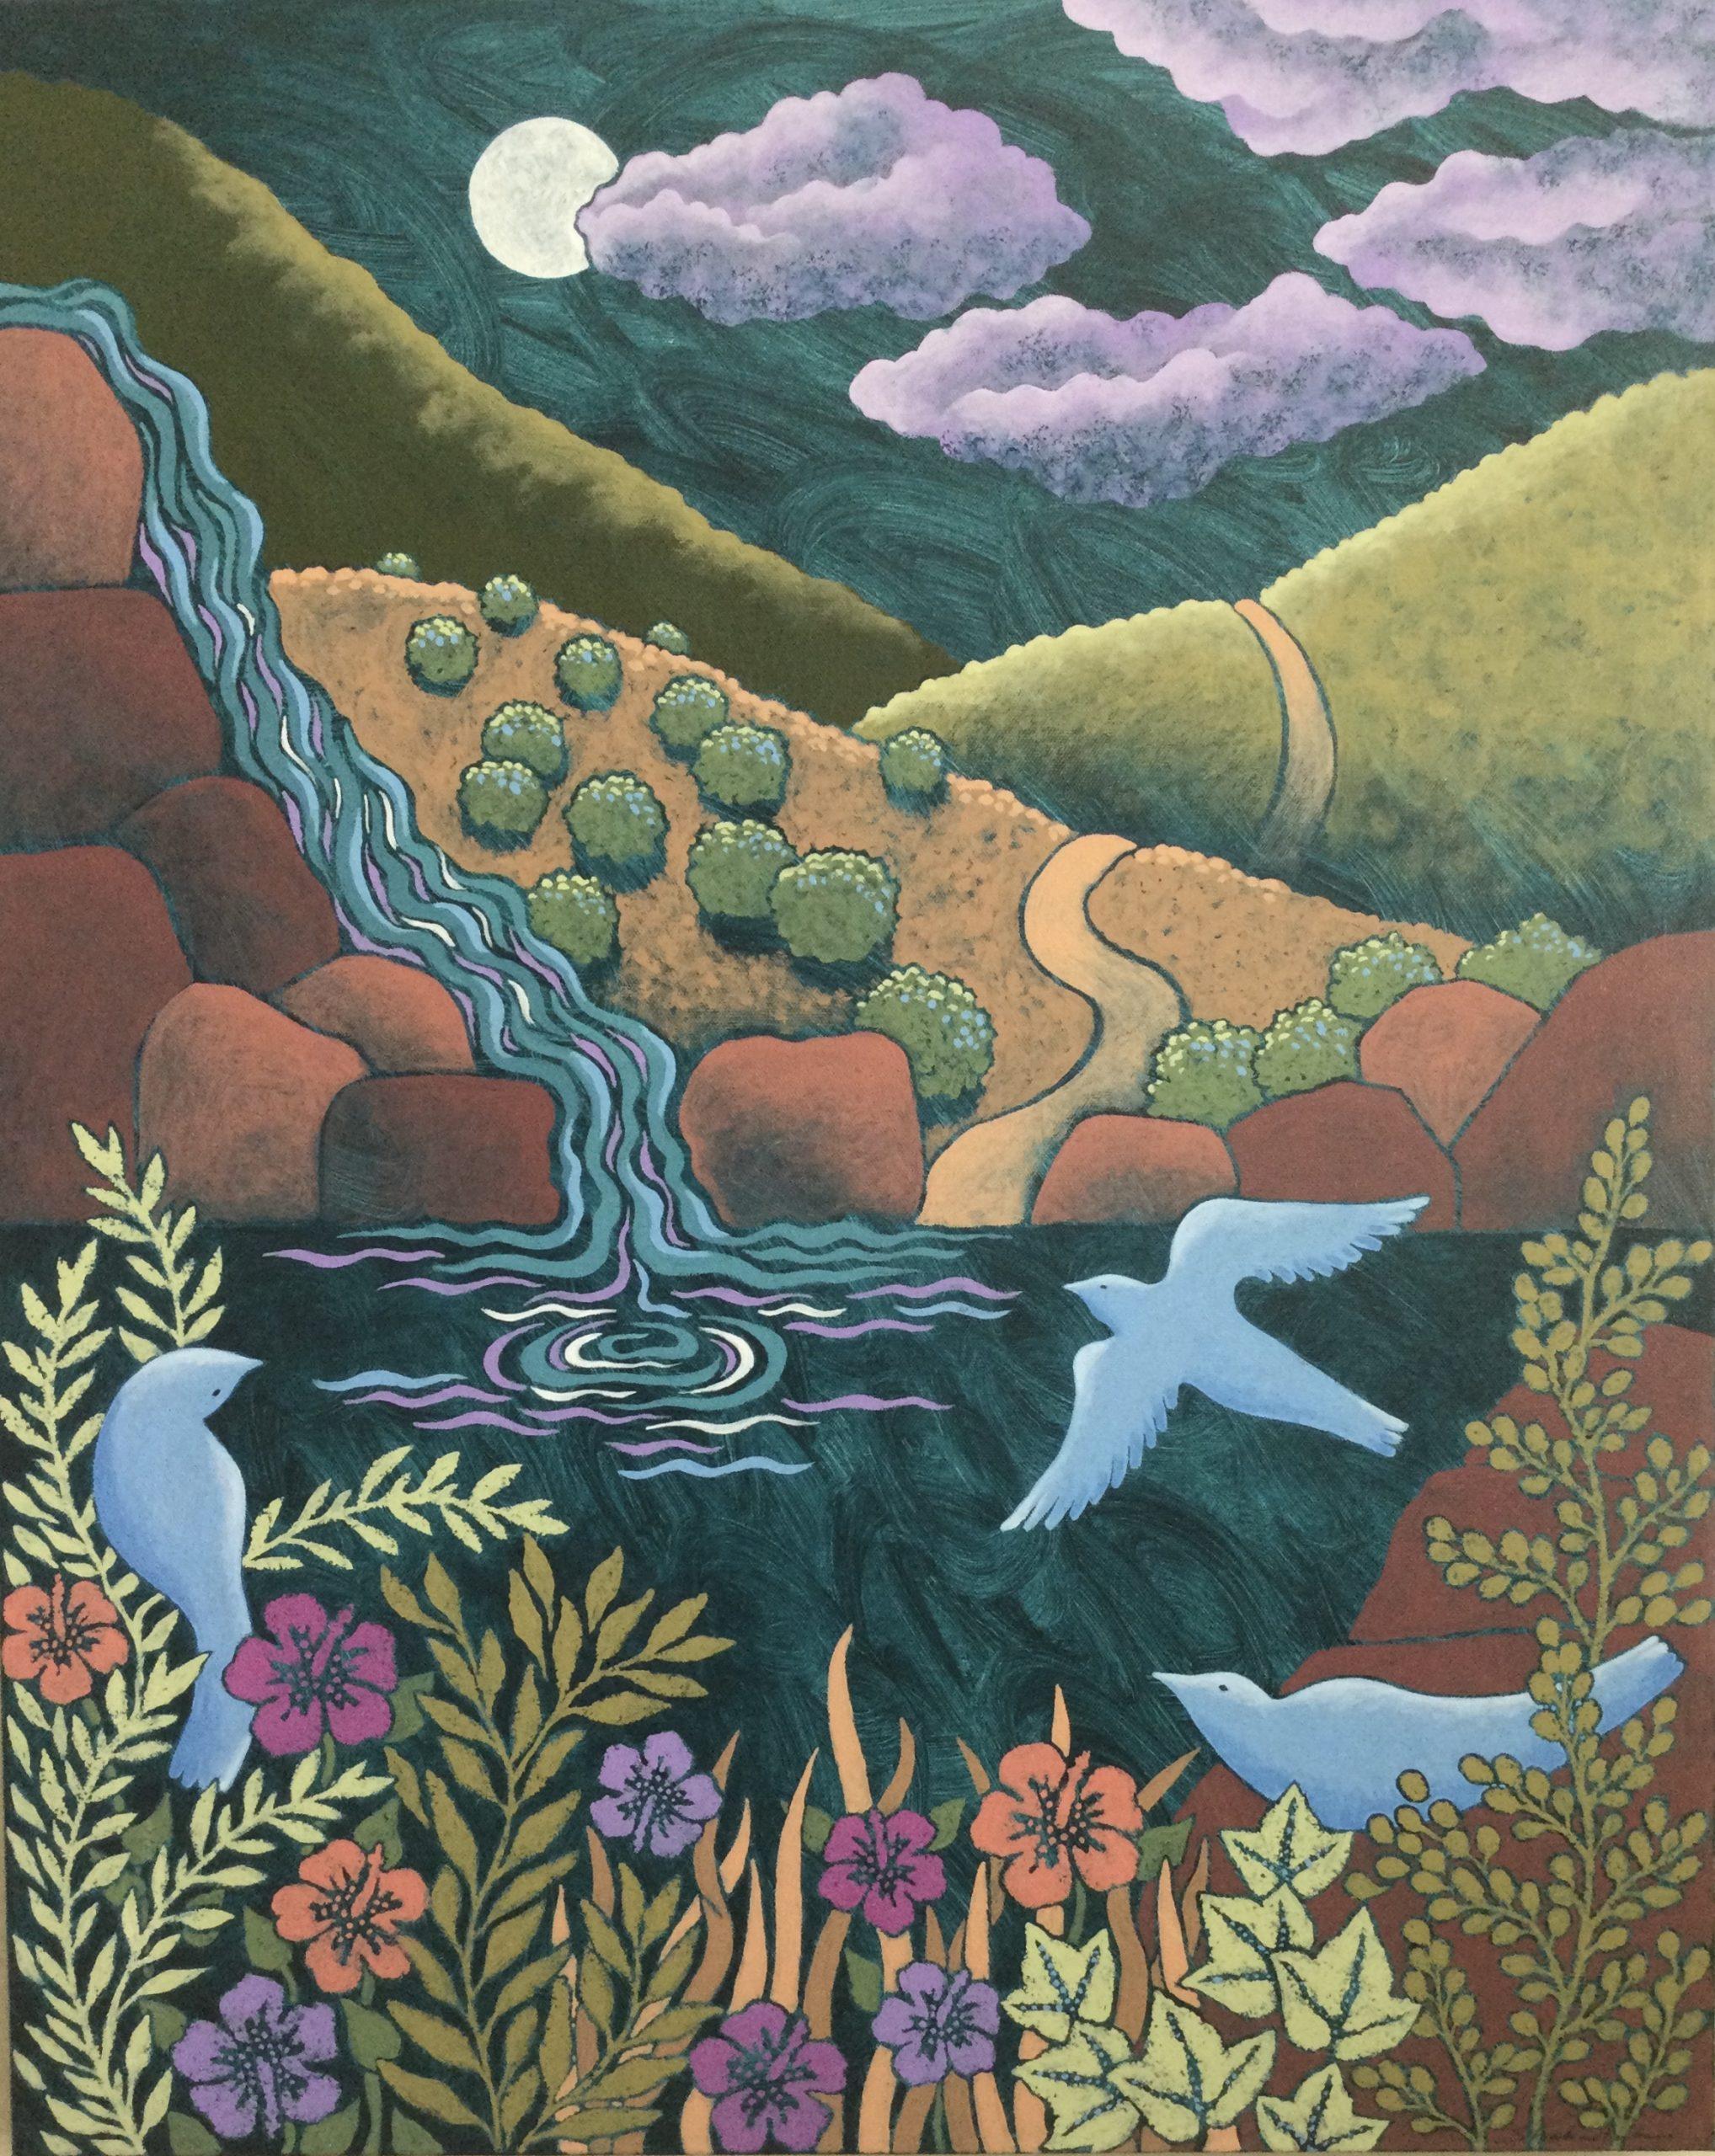 Shahastra Levi LOVE POEMS: Inspiration acrylic on canvas